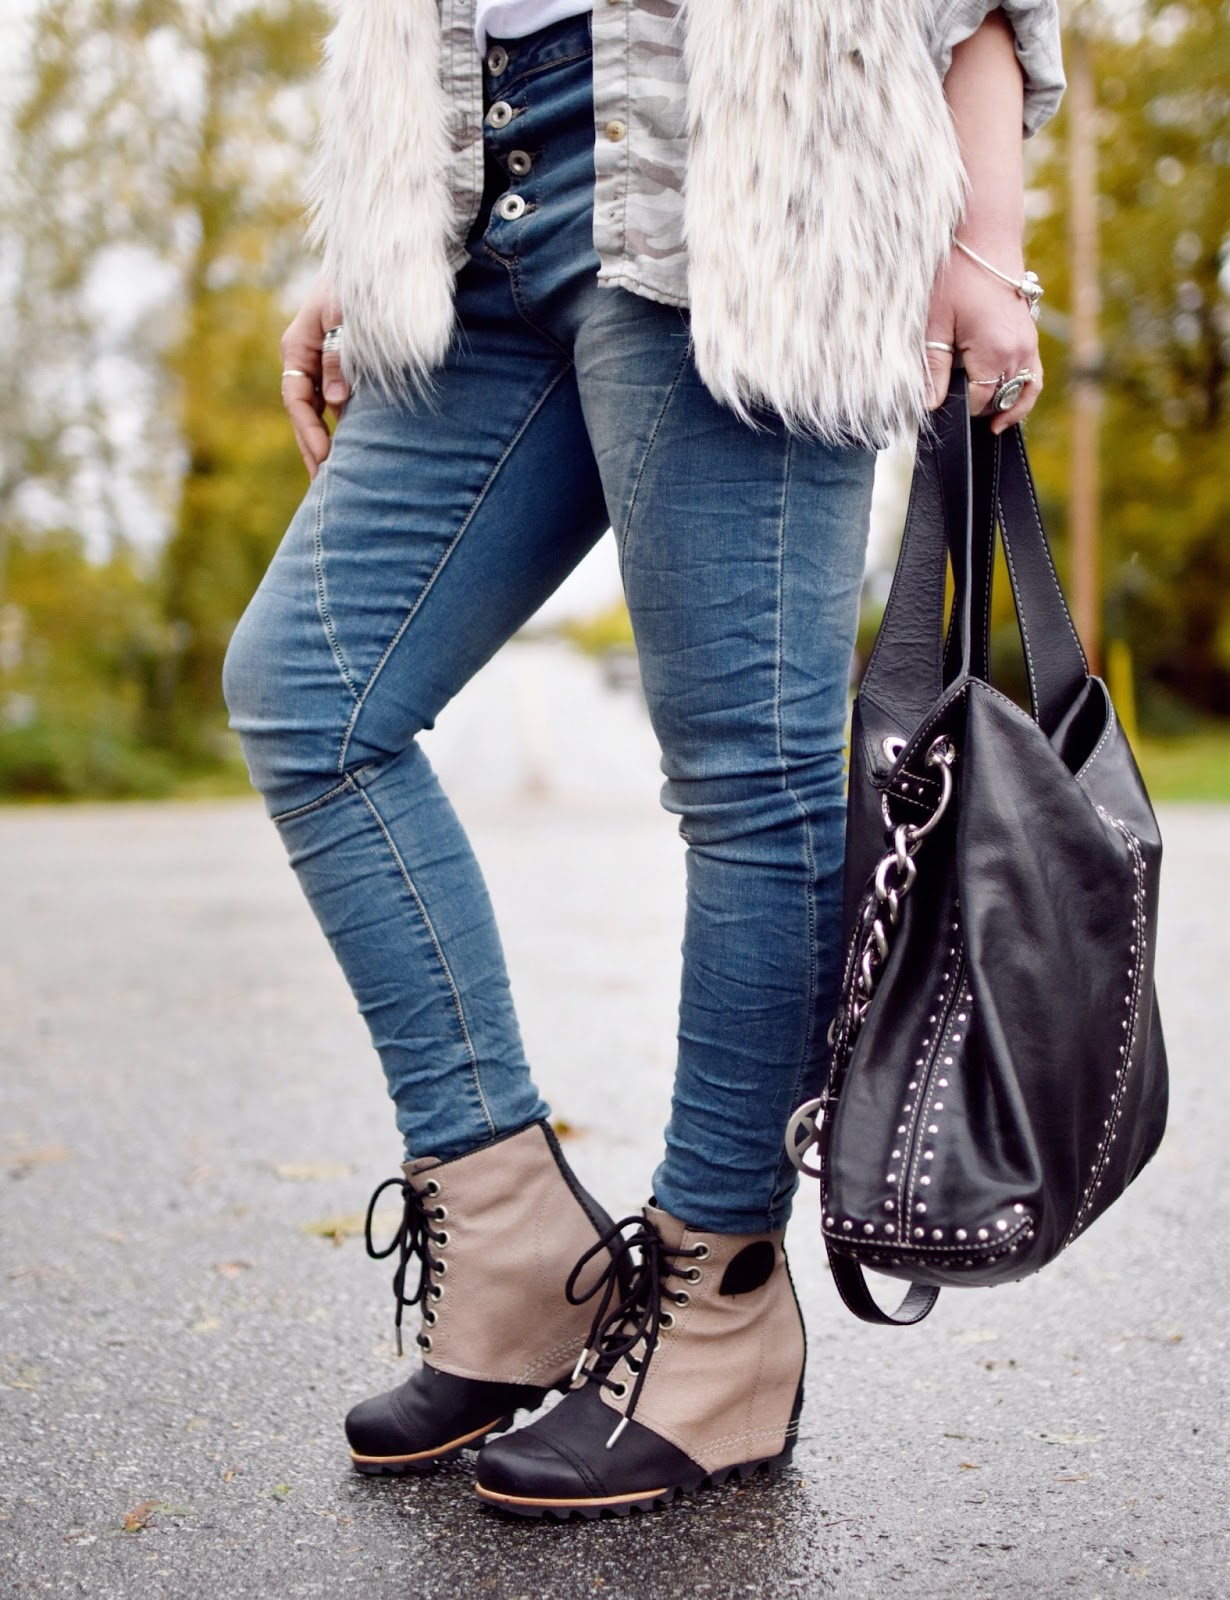 Outfit inspiration c/o Monika Faulkner - skinny jeans, faux-fur vest, Sorel booties, MK bag